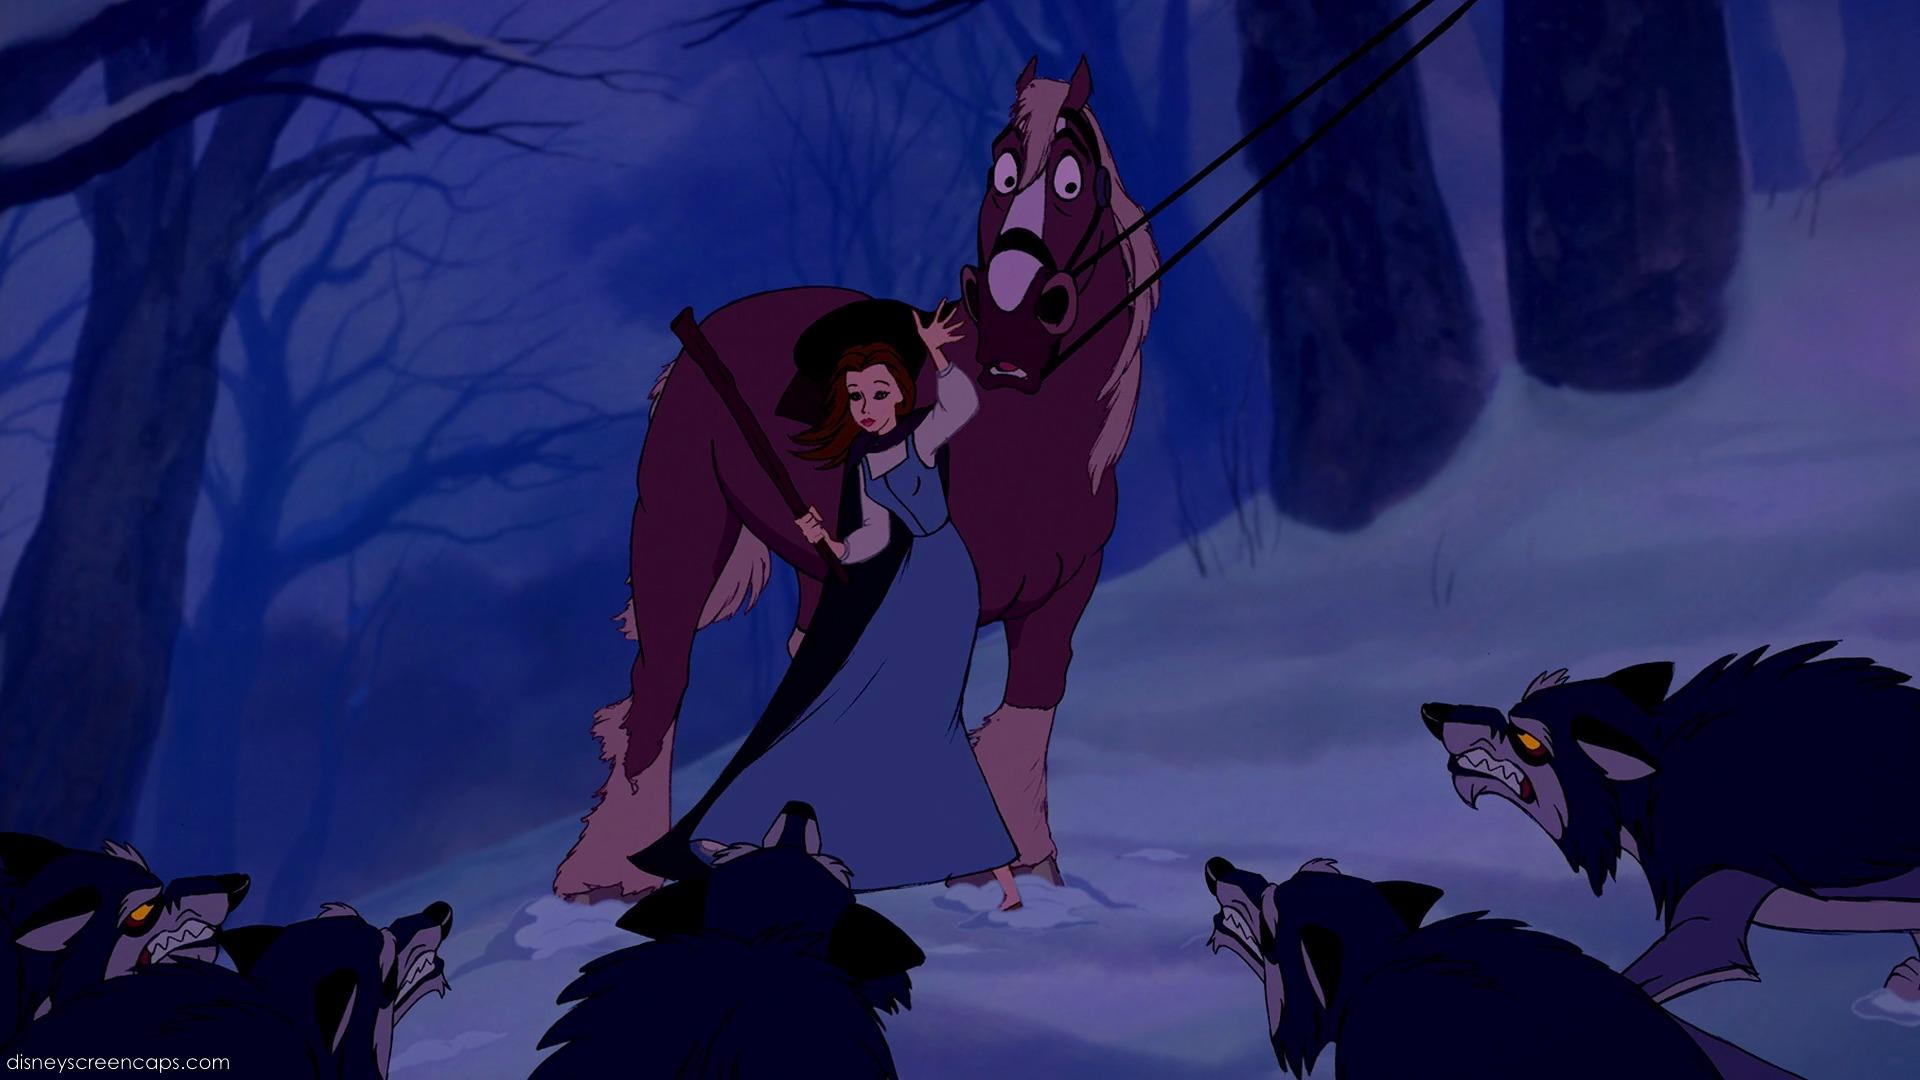 The Người sói Attack scene